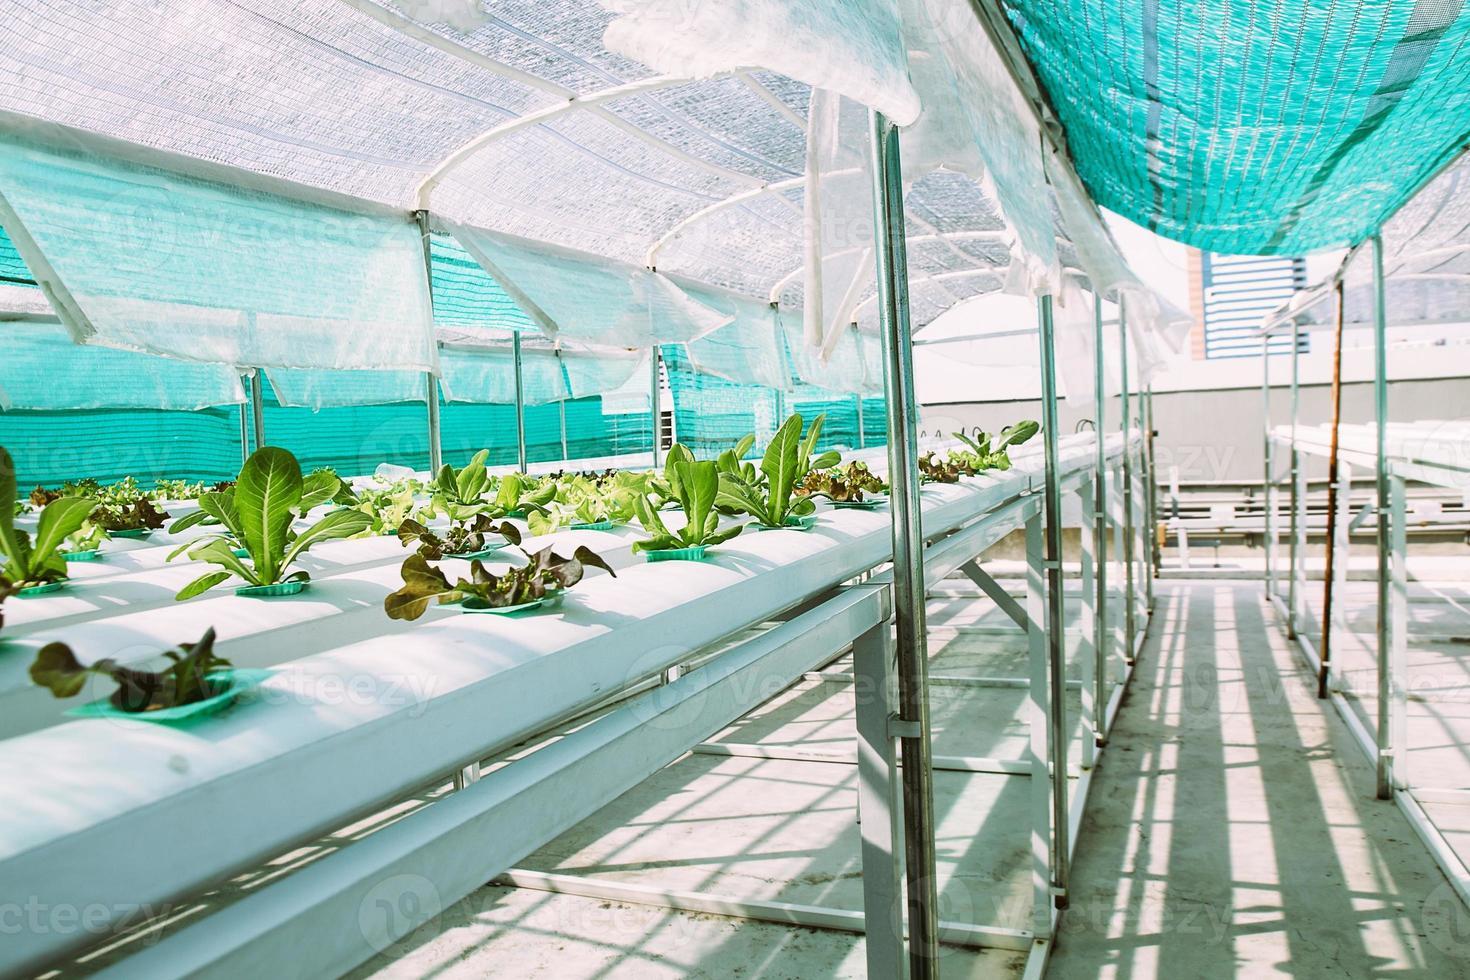 groene plantaardige hydrocultuurboerderij. foto